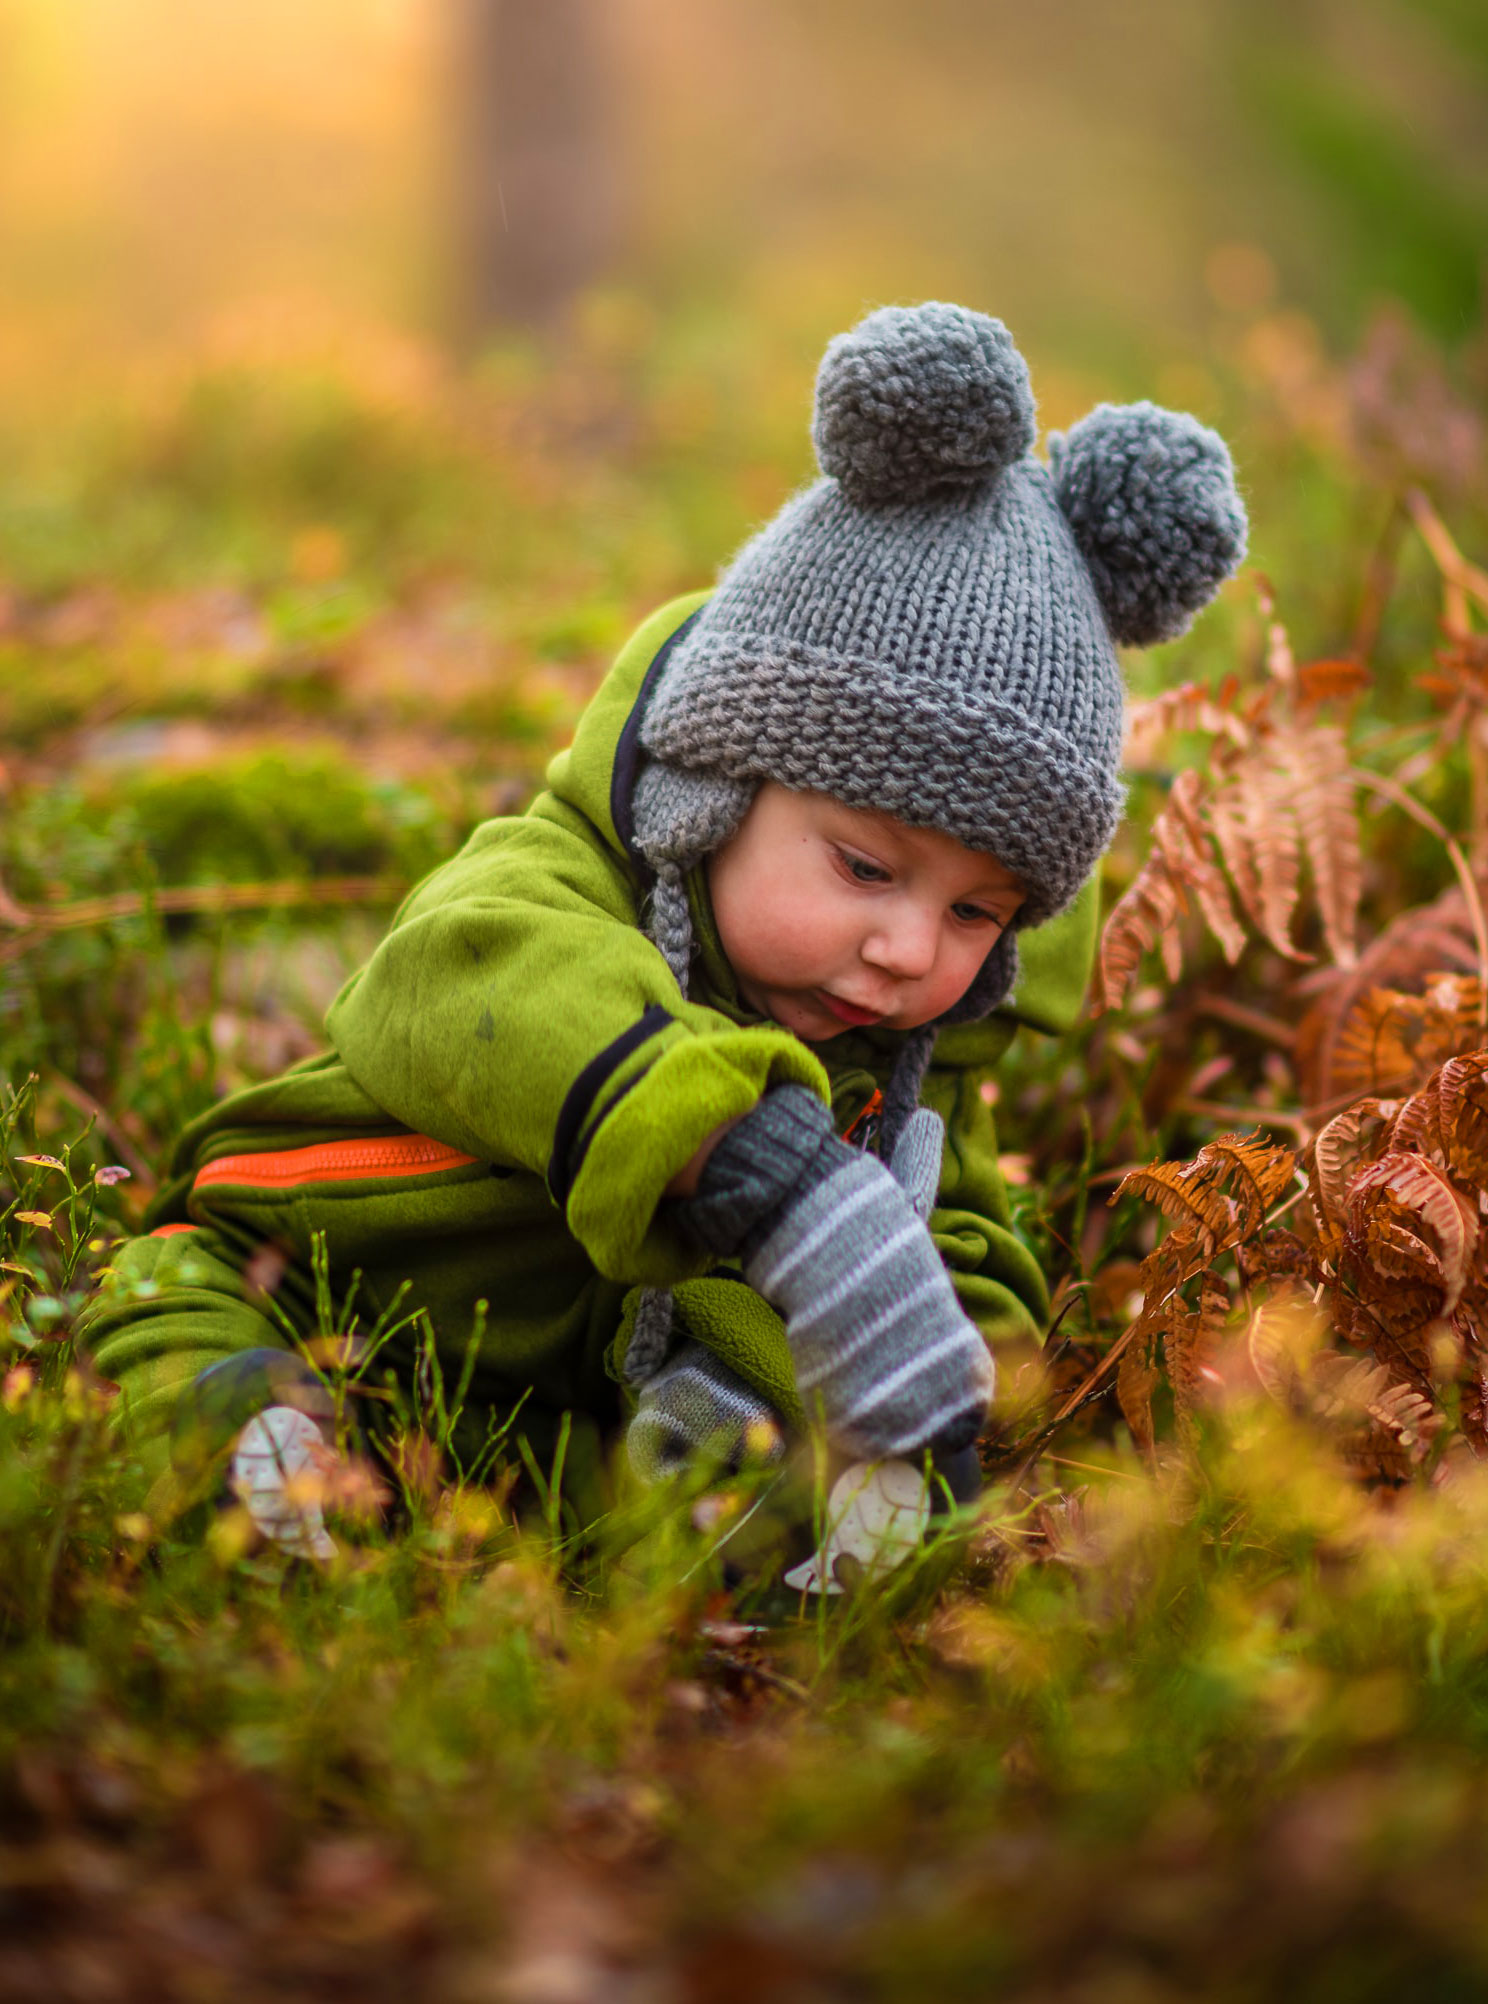 New Stylish Baby Boy Whatsapp Dp Images photo free download